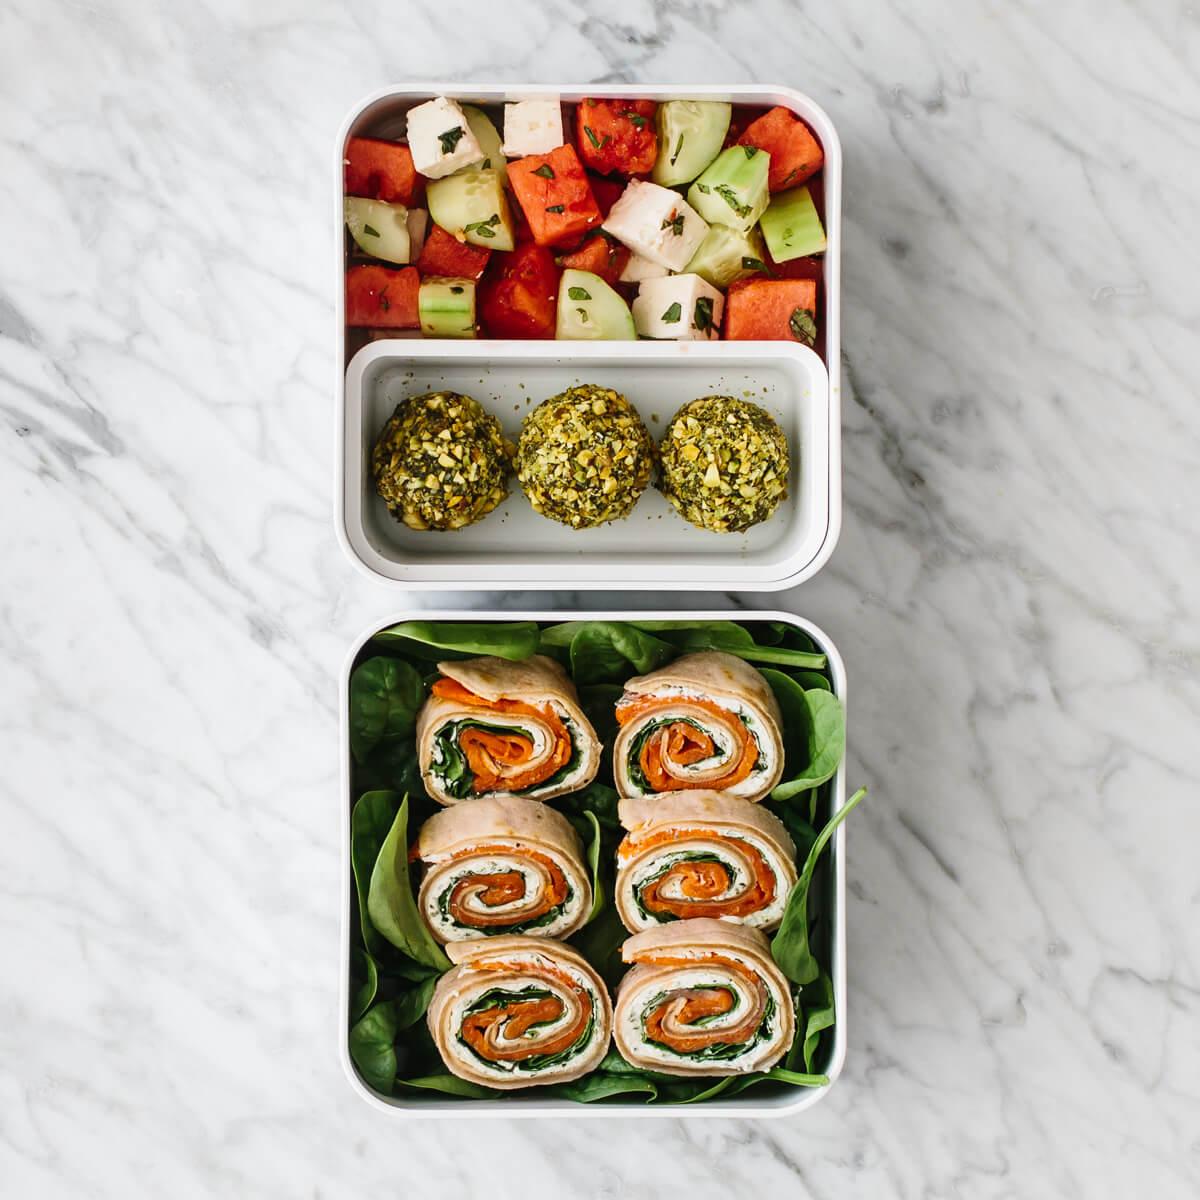 Bento box filled with pinwheels, energy balls and fruit salad.